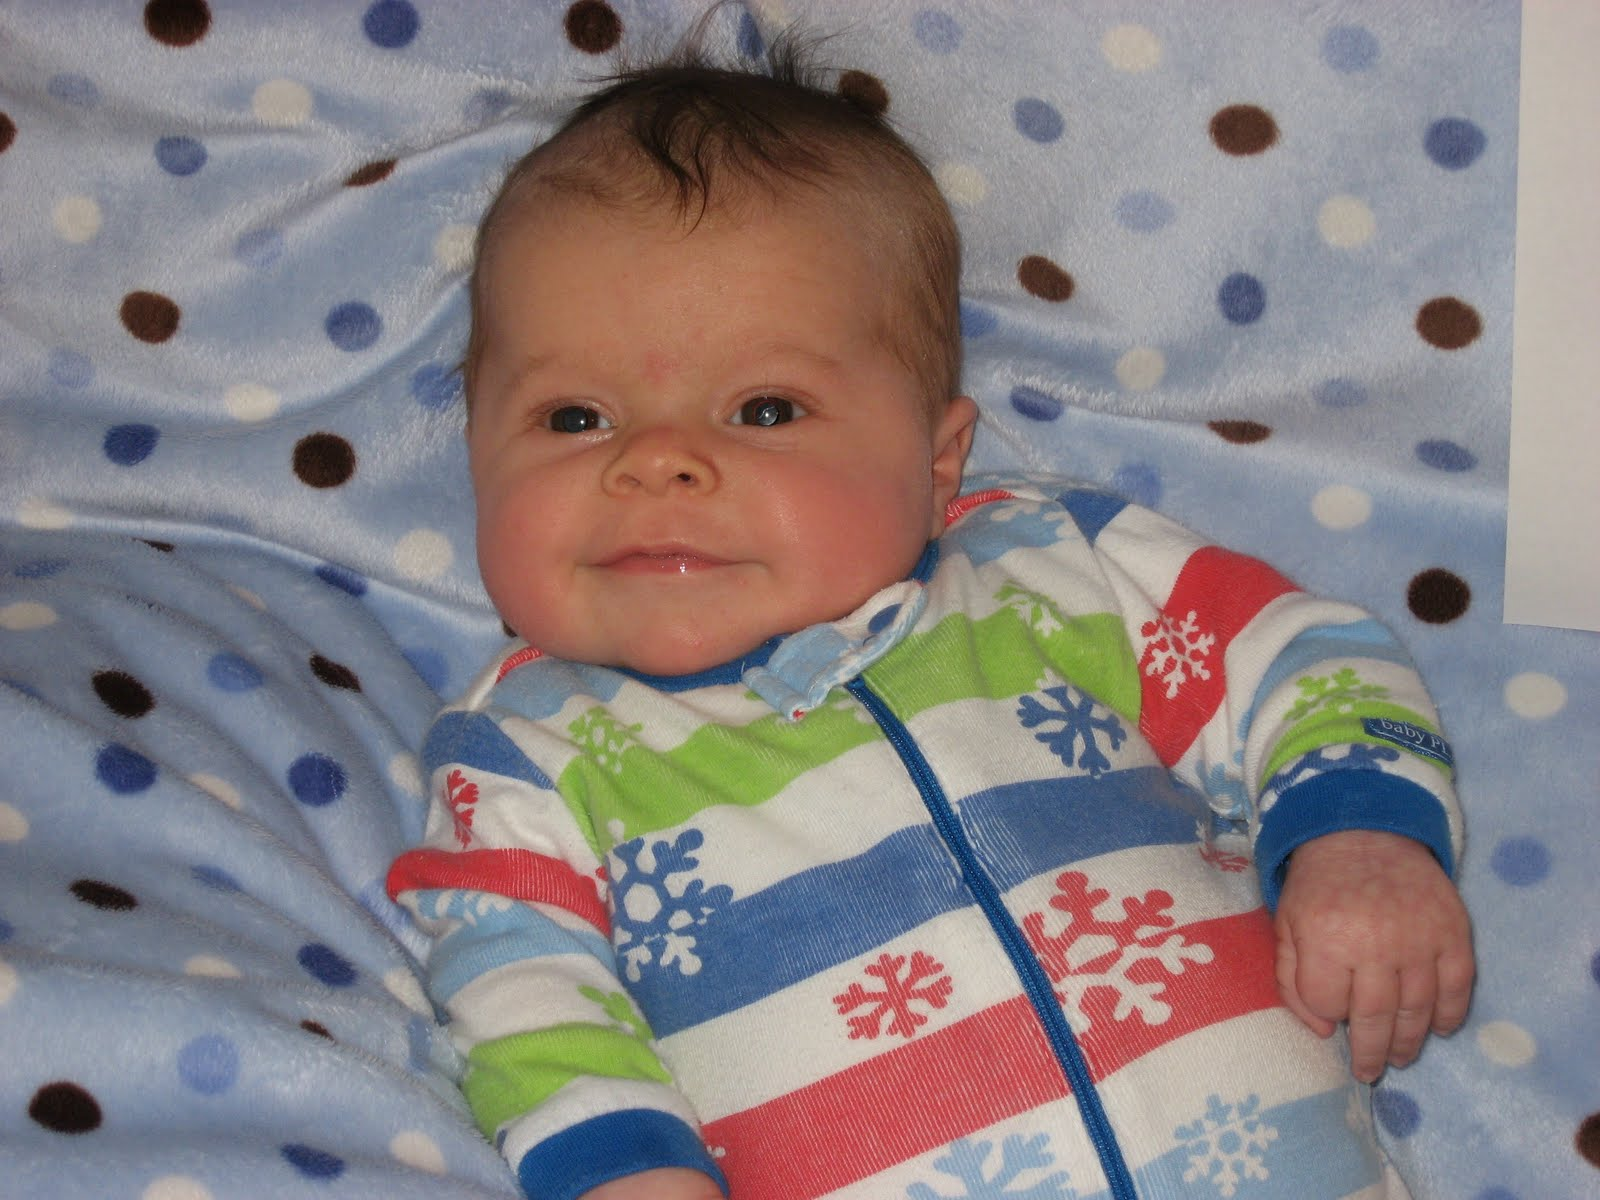 Baby Oliver 2 Months Old